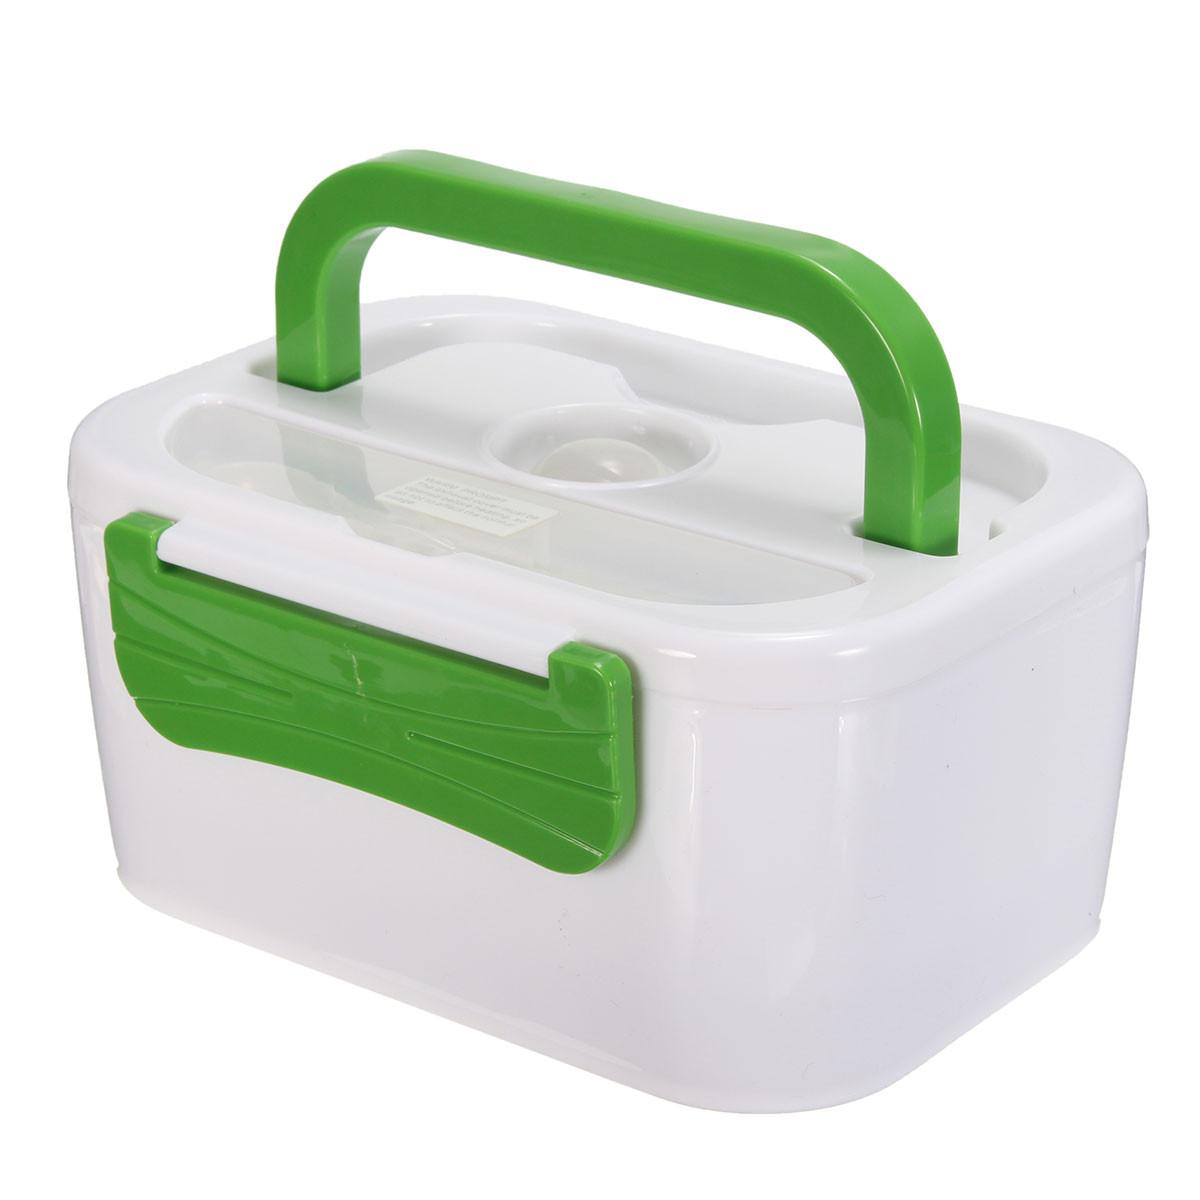 220v electrical heating bento box potable picnic lunch. Black Bedroom Furniture Sets. Home Design Ideas